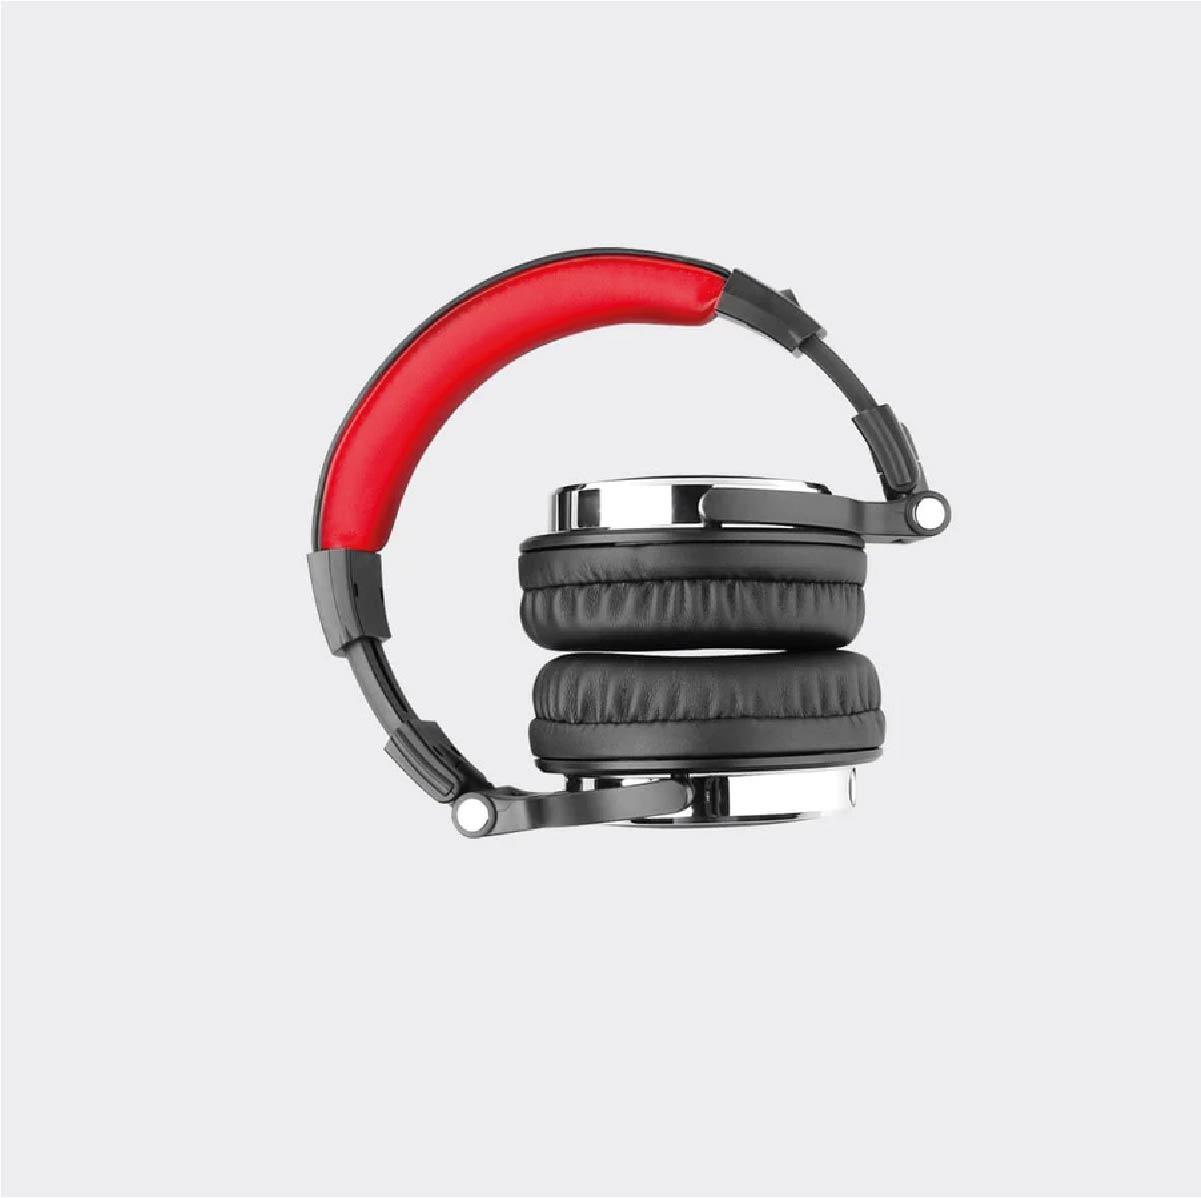 Fone de Ouvido Oneodio Pro10 Black/Red